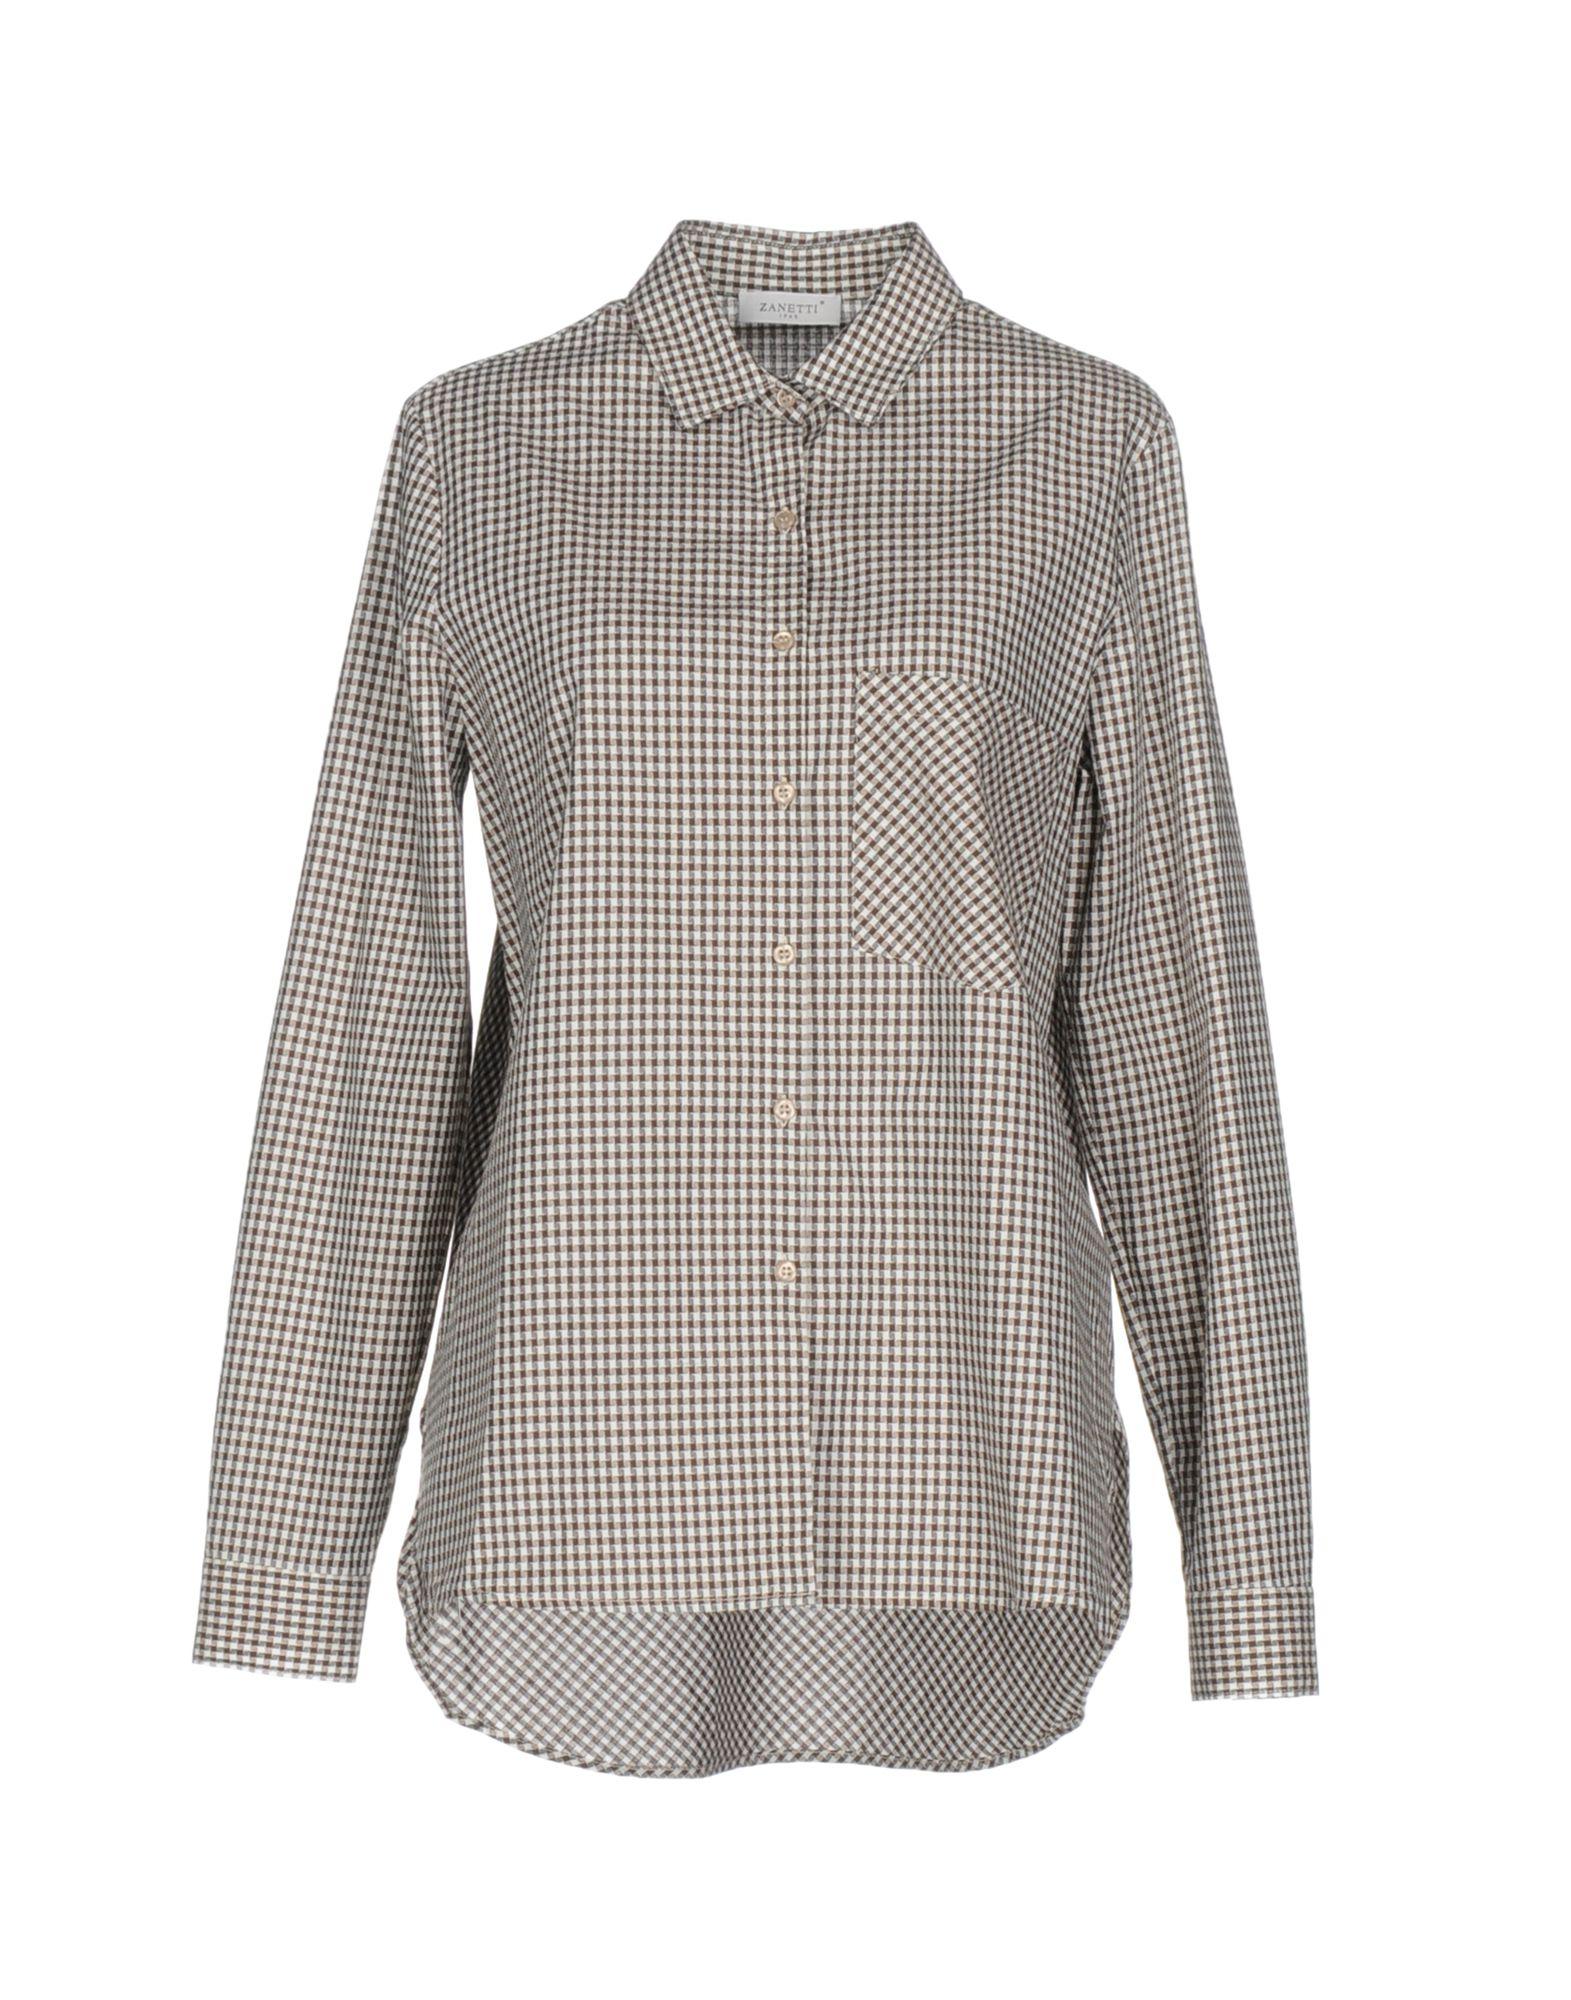 ФОТО zanetti 1965 pубашка